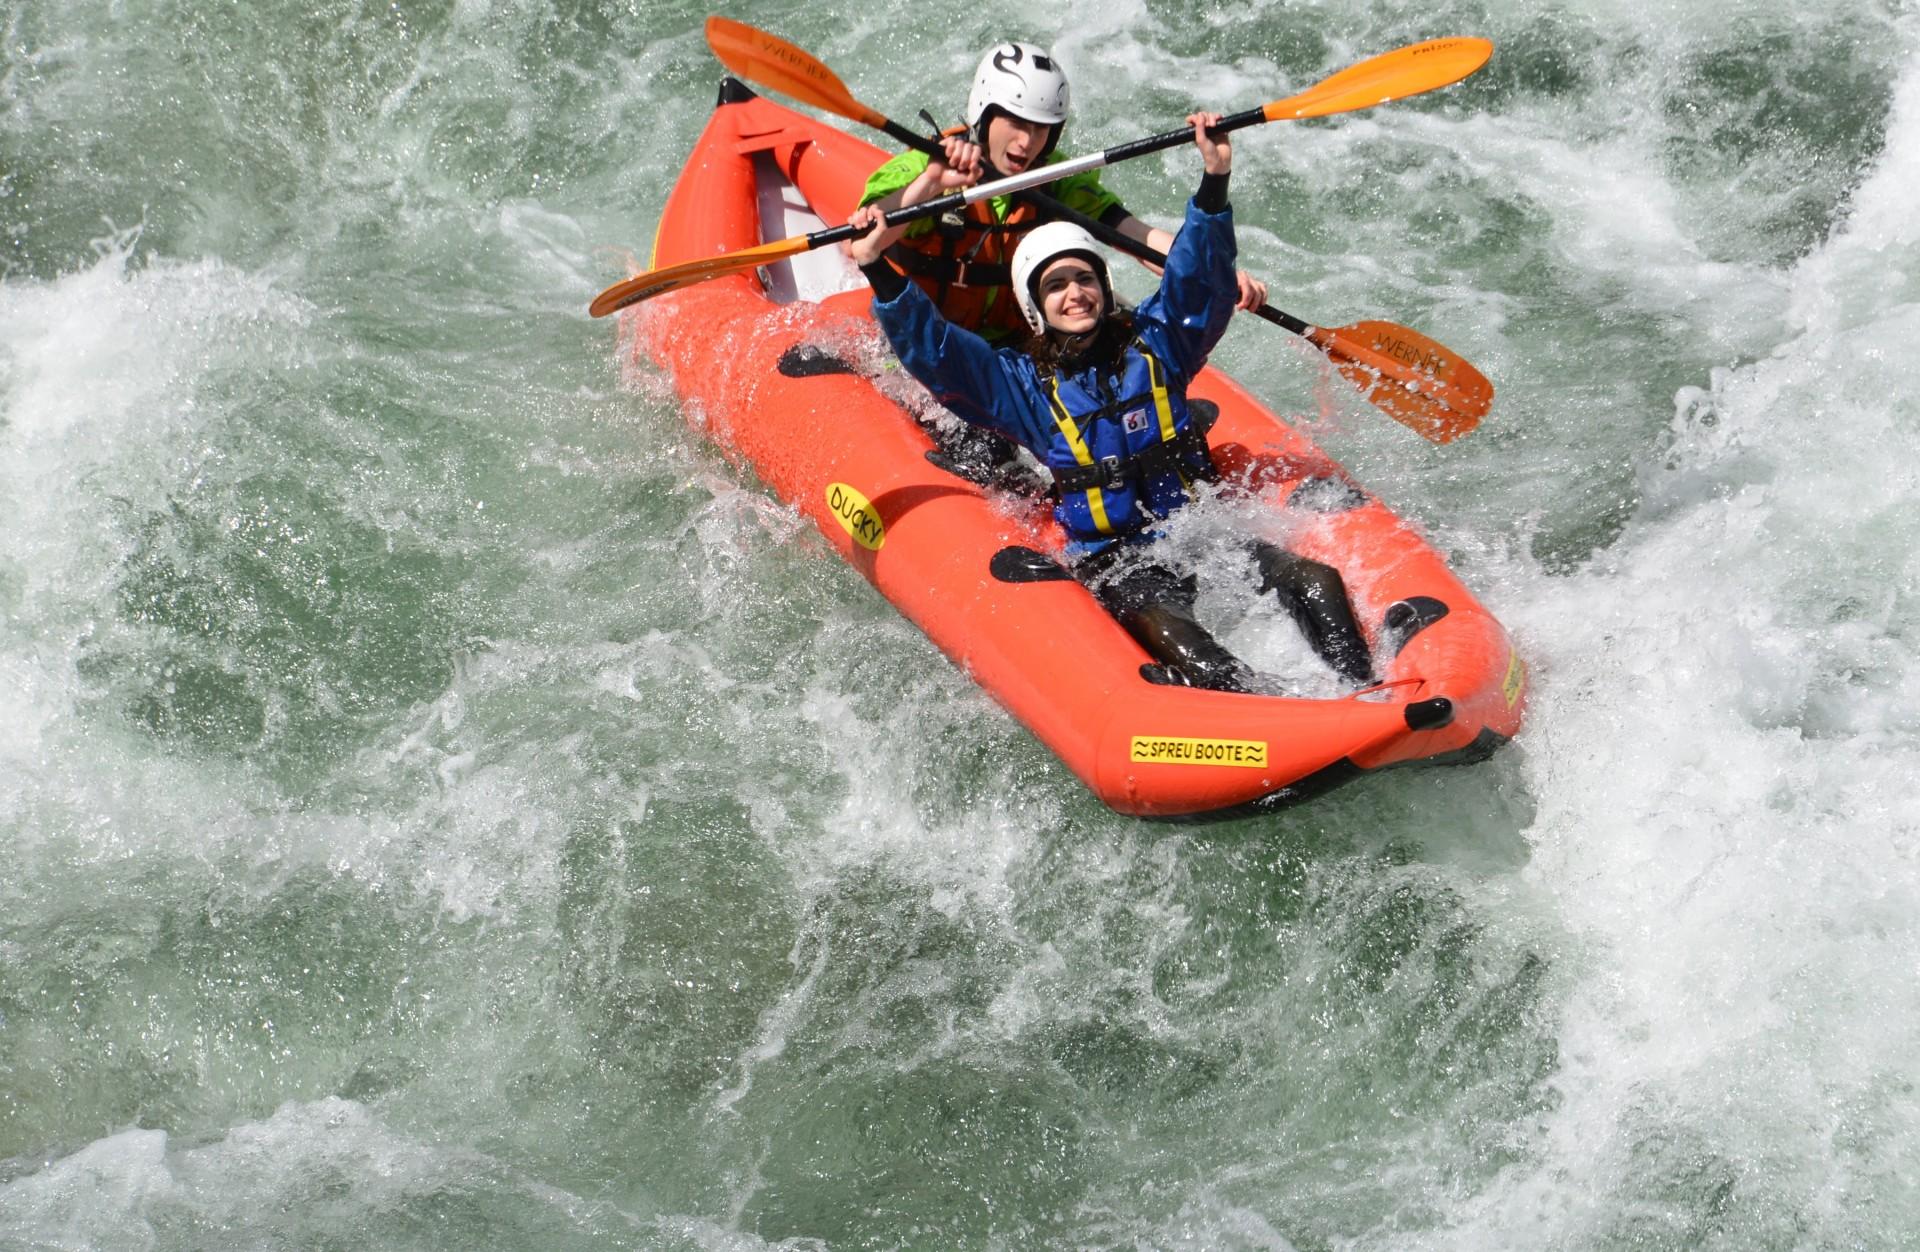 Kayak in Valsesia - Valle Alpina del Piemonte